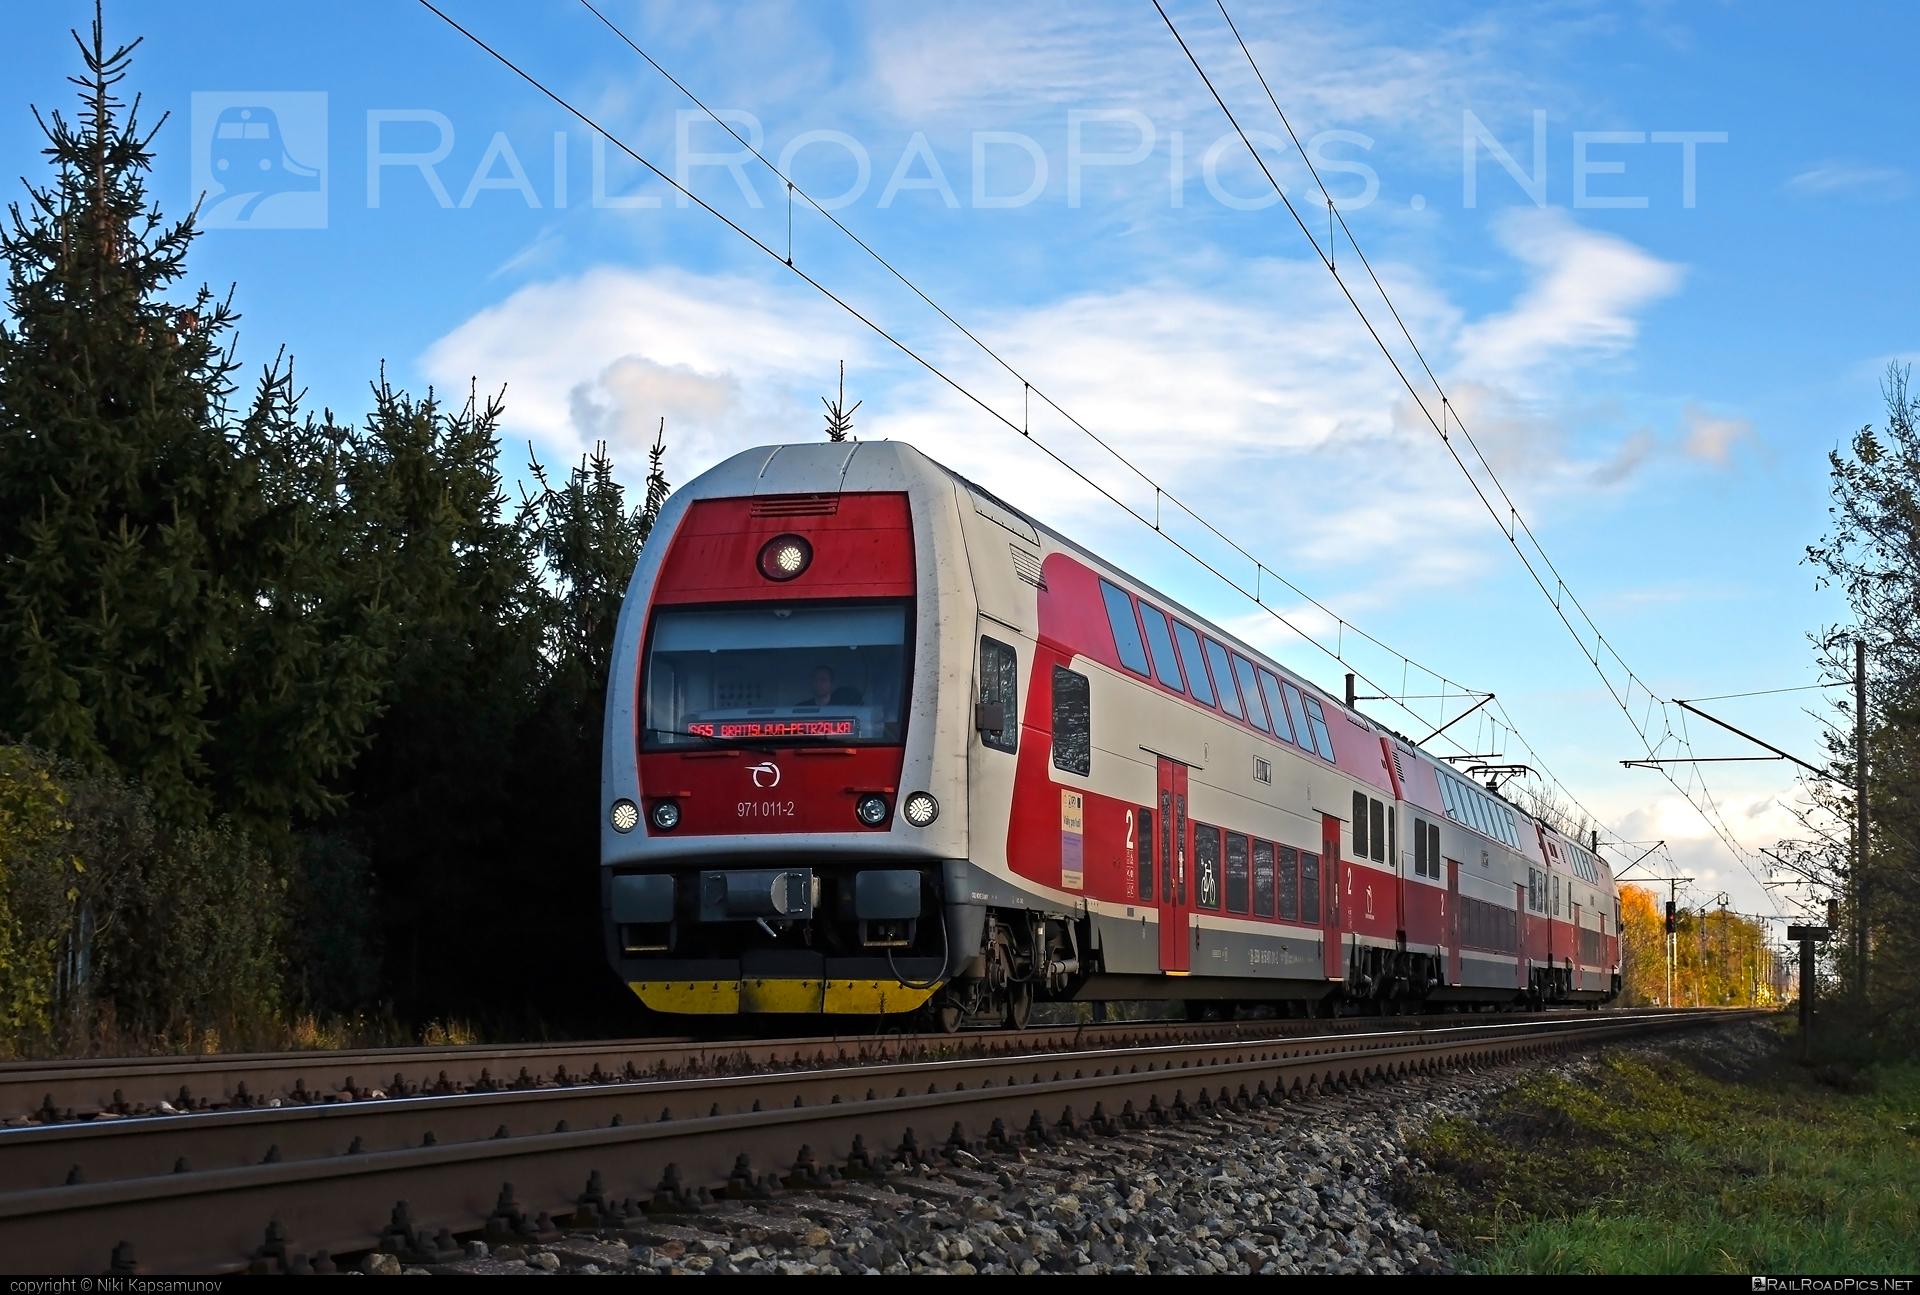 Škoda 4Ev - 971 011-2 operated by Železničná Spoločnost' Slovensko, a.s. #ZeleznicnaSpolocnostSlovensko #emu671 #skoda #skoda4ev #skodaclass671 #zssk